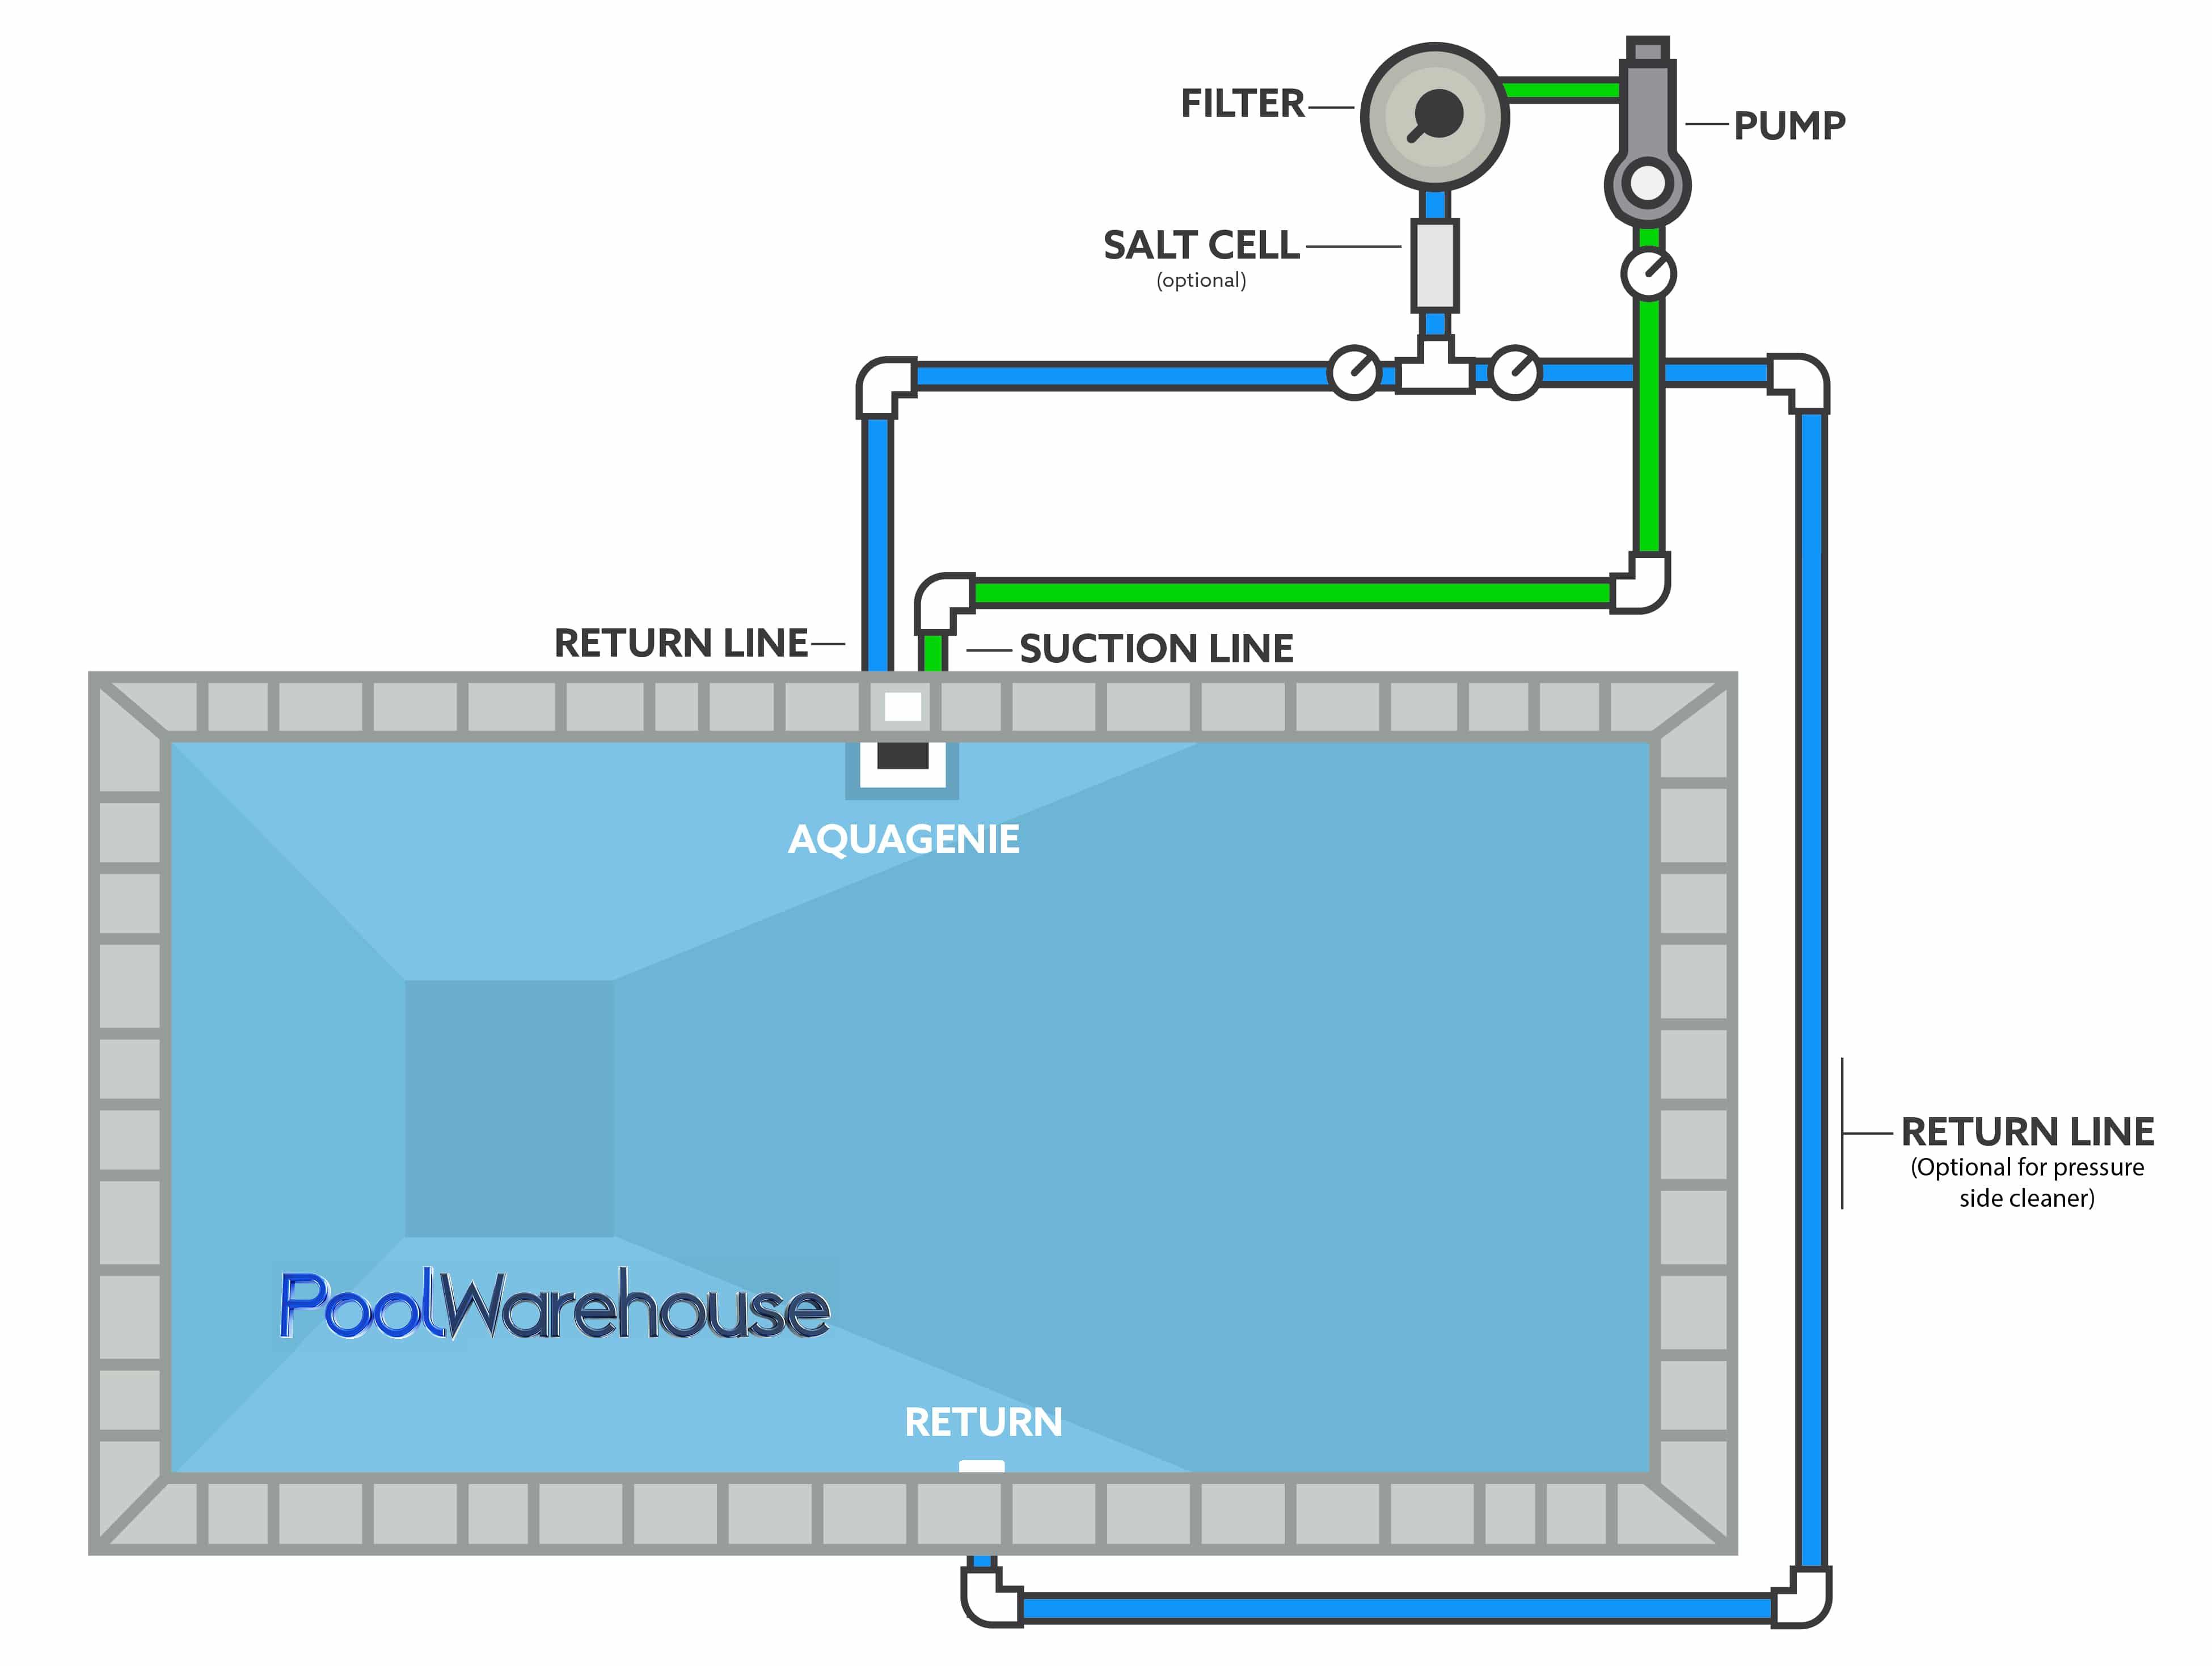 pool pump setup diagram cat6 wall plate wiring above ground pools plumbing all data swimming diagrams inground kit layouts hayward